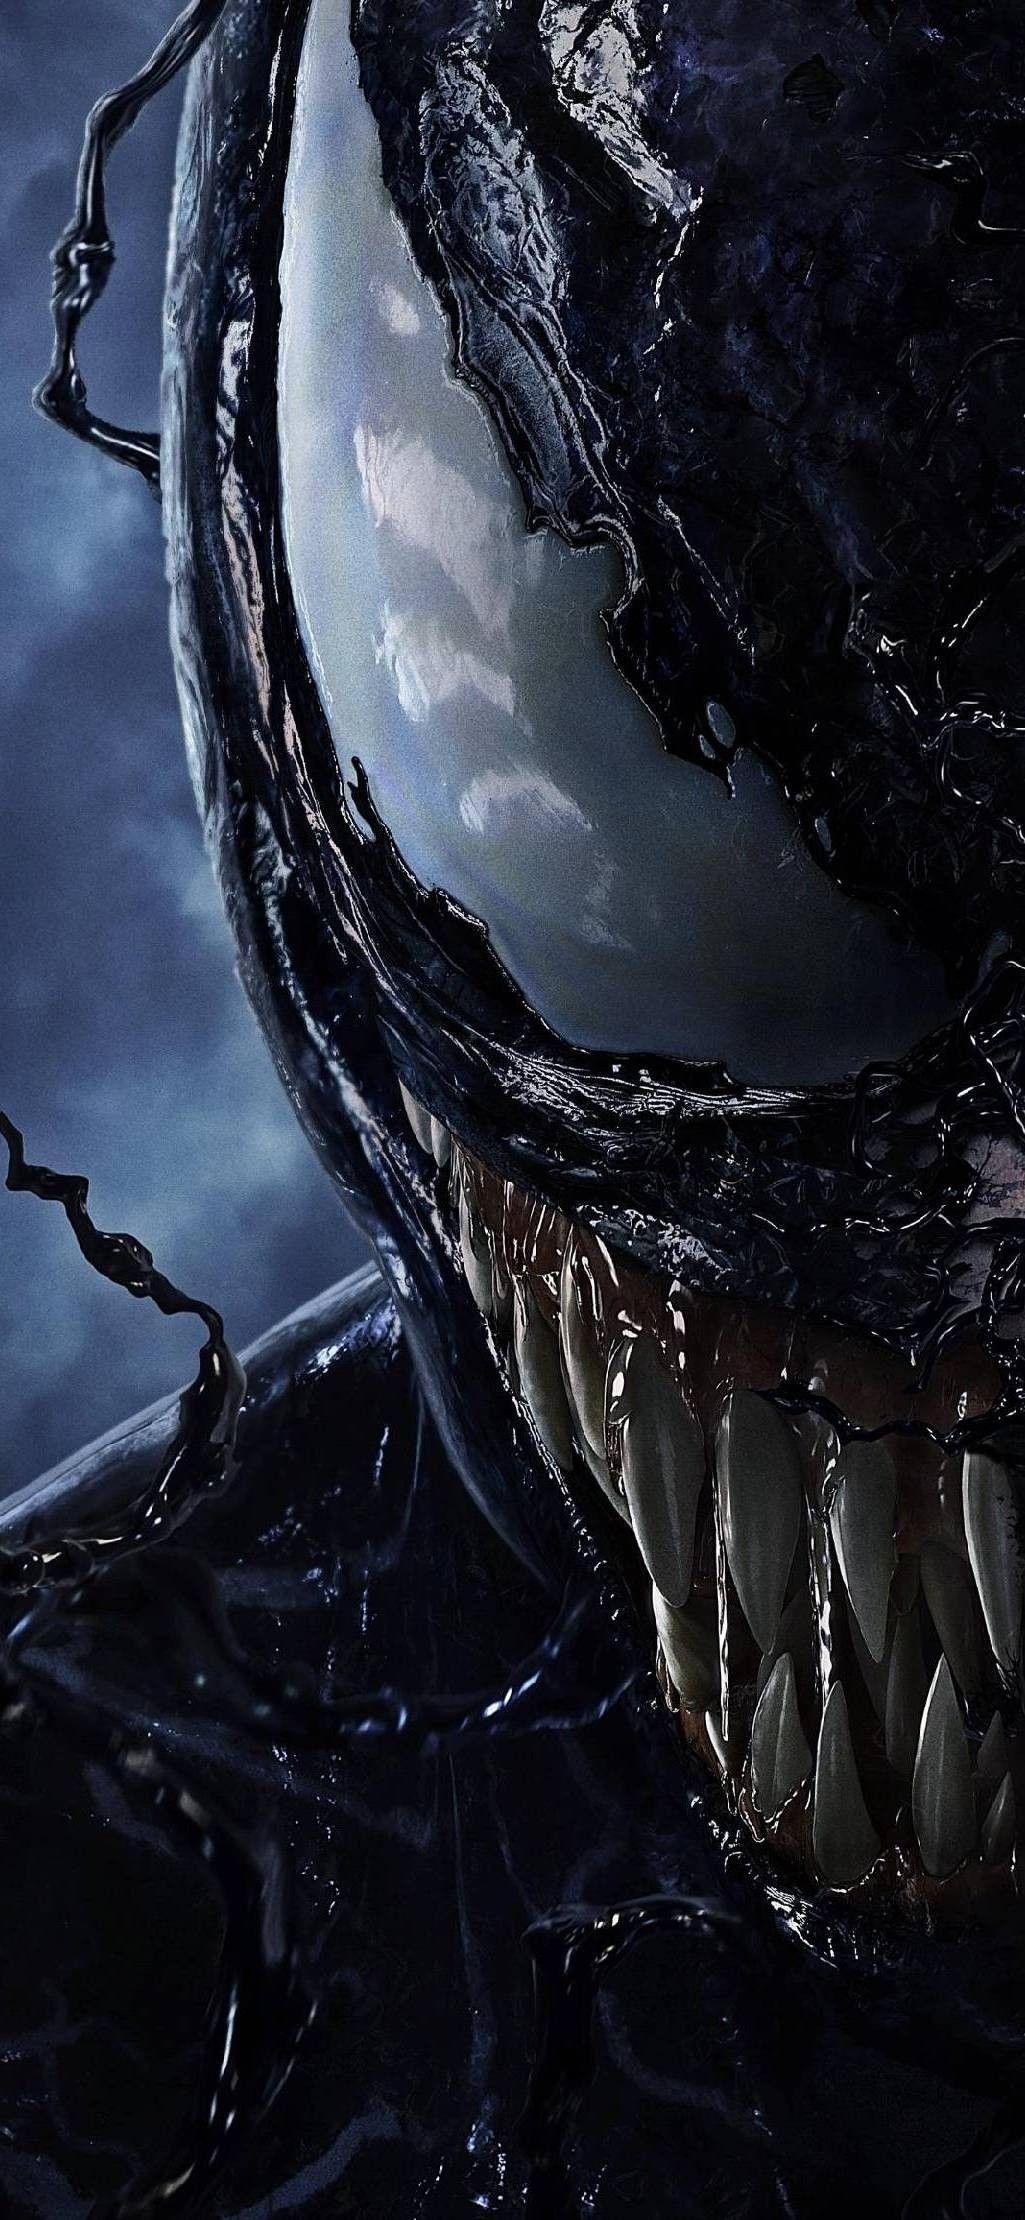 We Are Venom 4k Amoled Wallpaper Imagenes De Venom Venom Wallpaper Magnificos